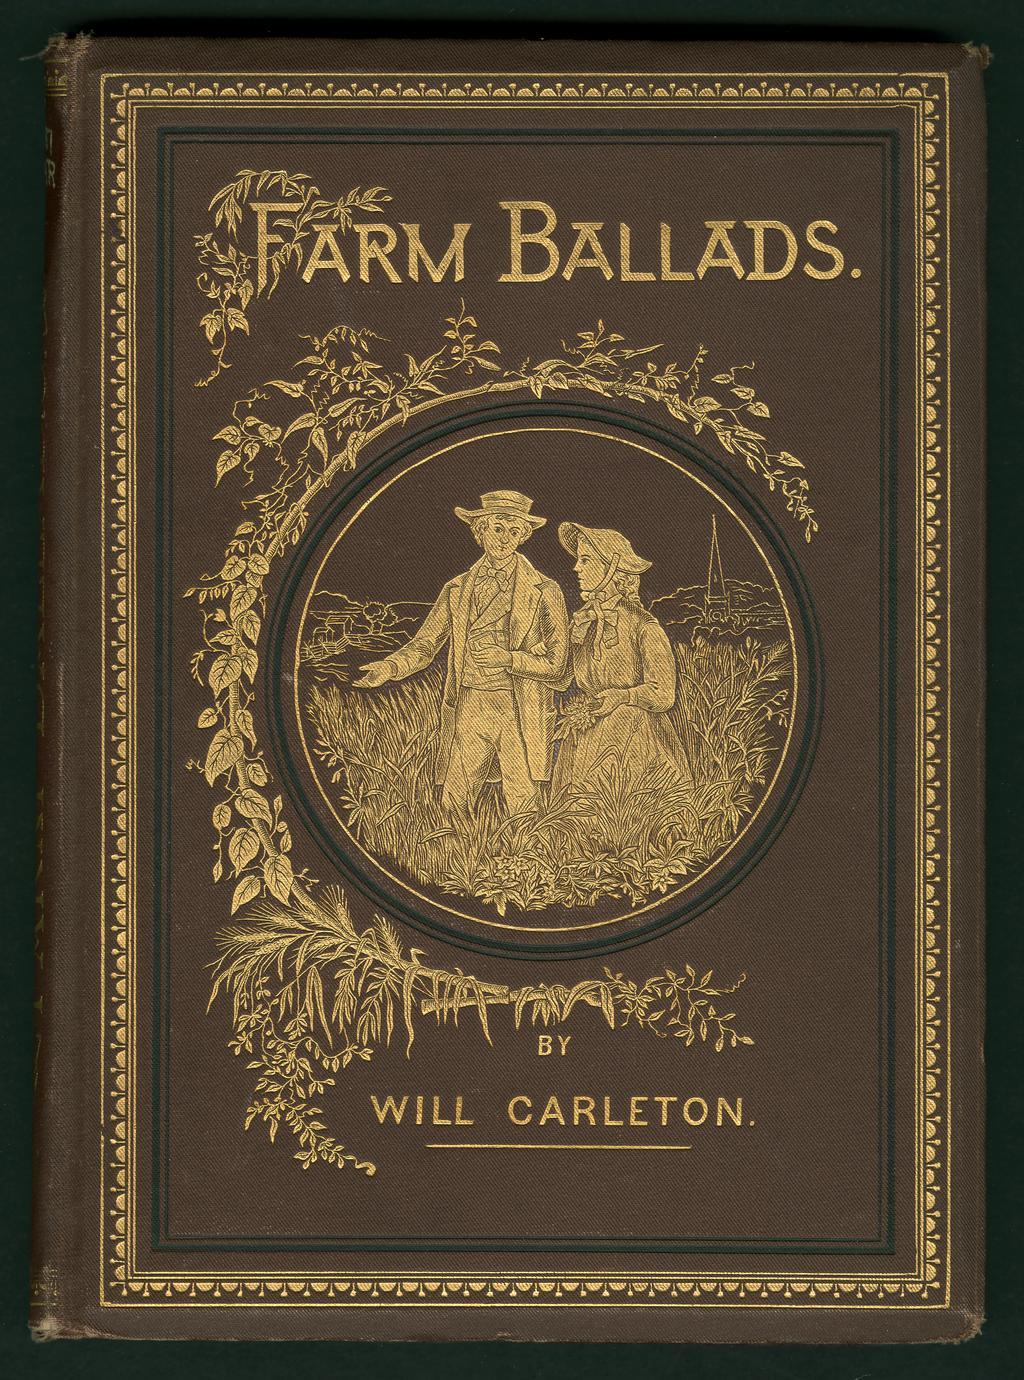 Farm ballads (1 of 4)